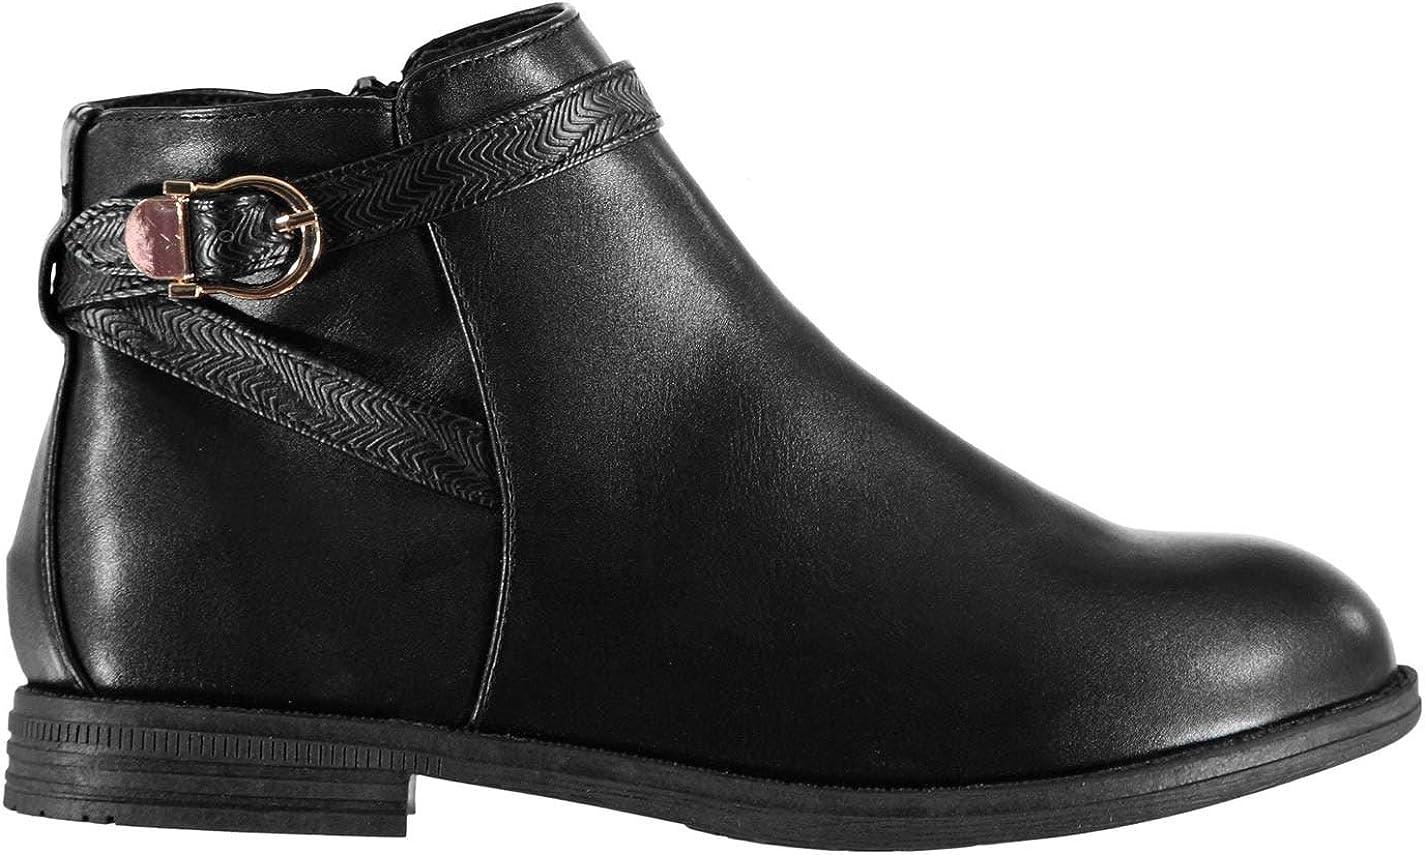 miso Girls Buckle Child Boots Black